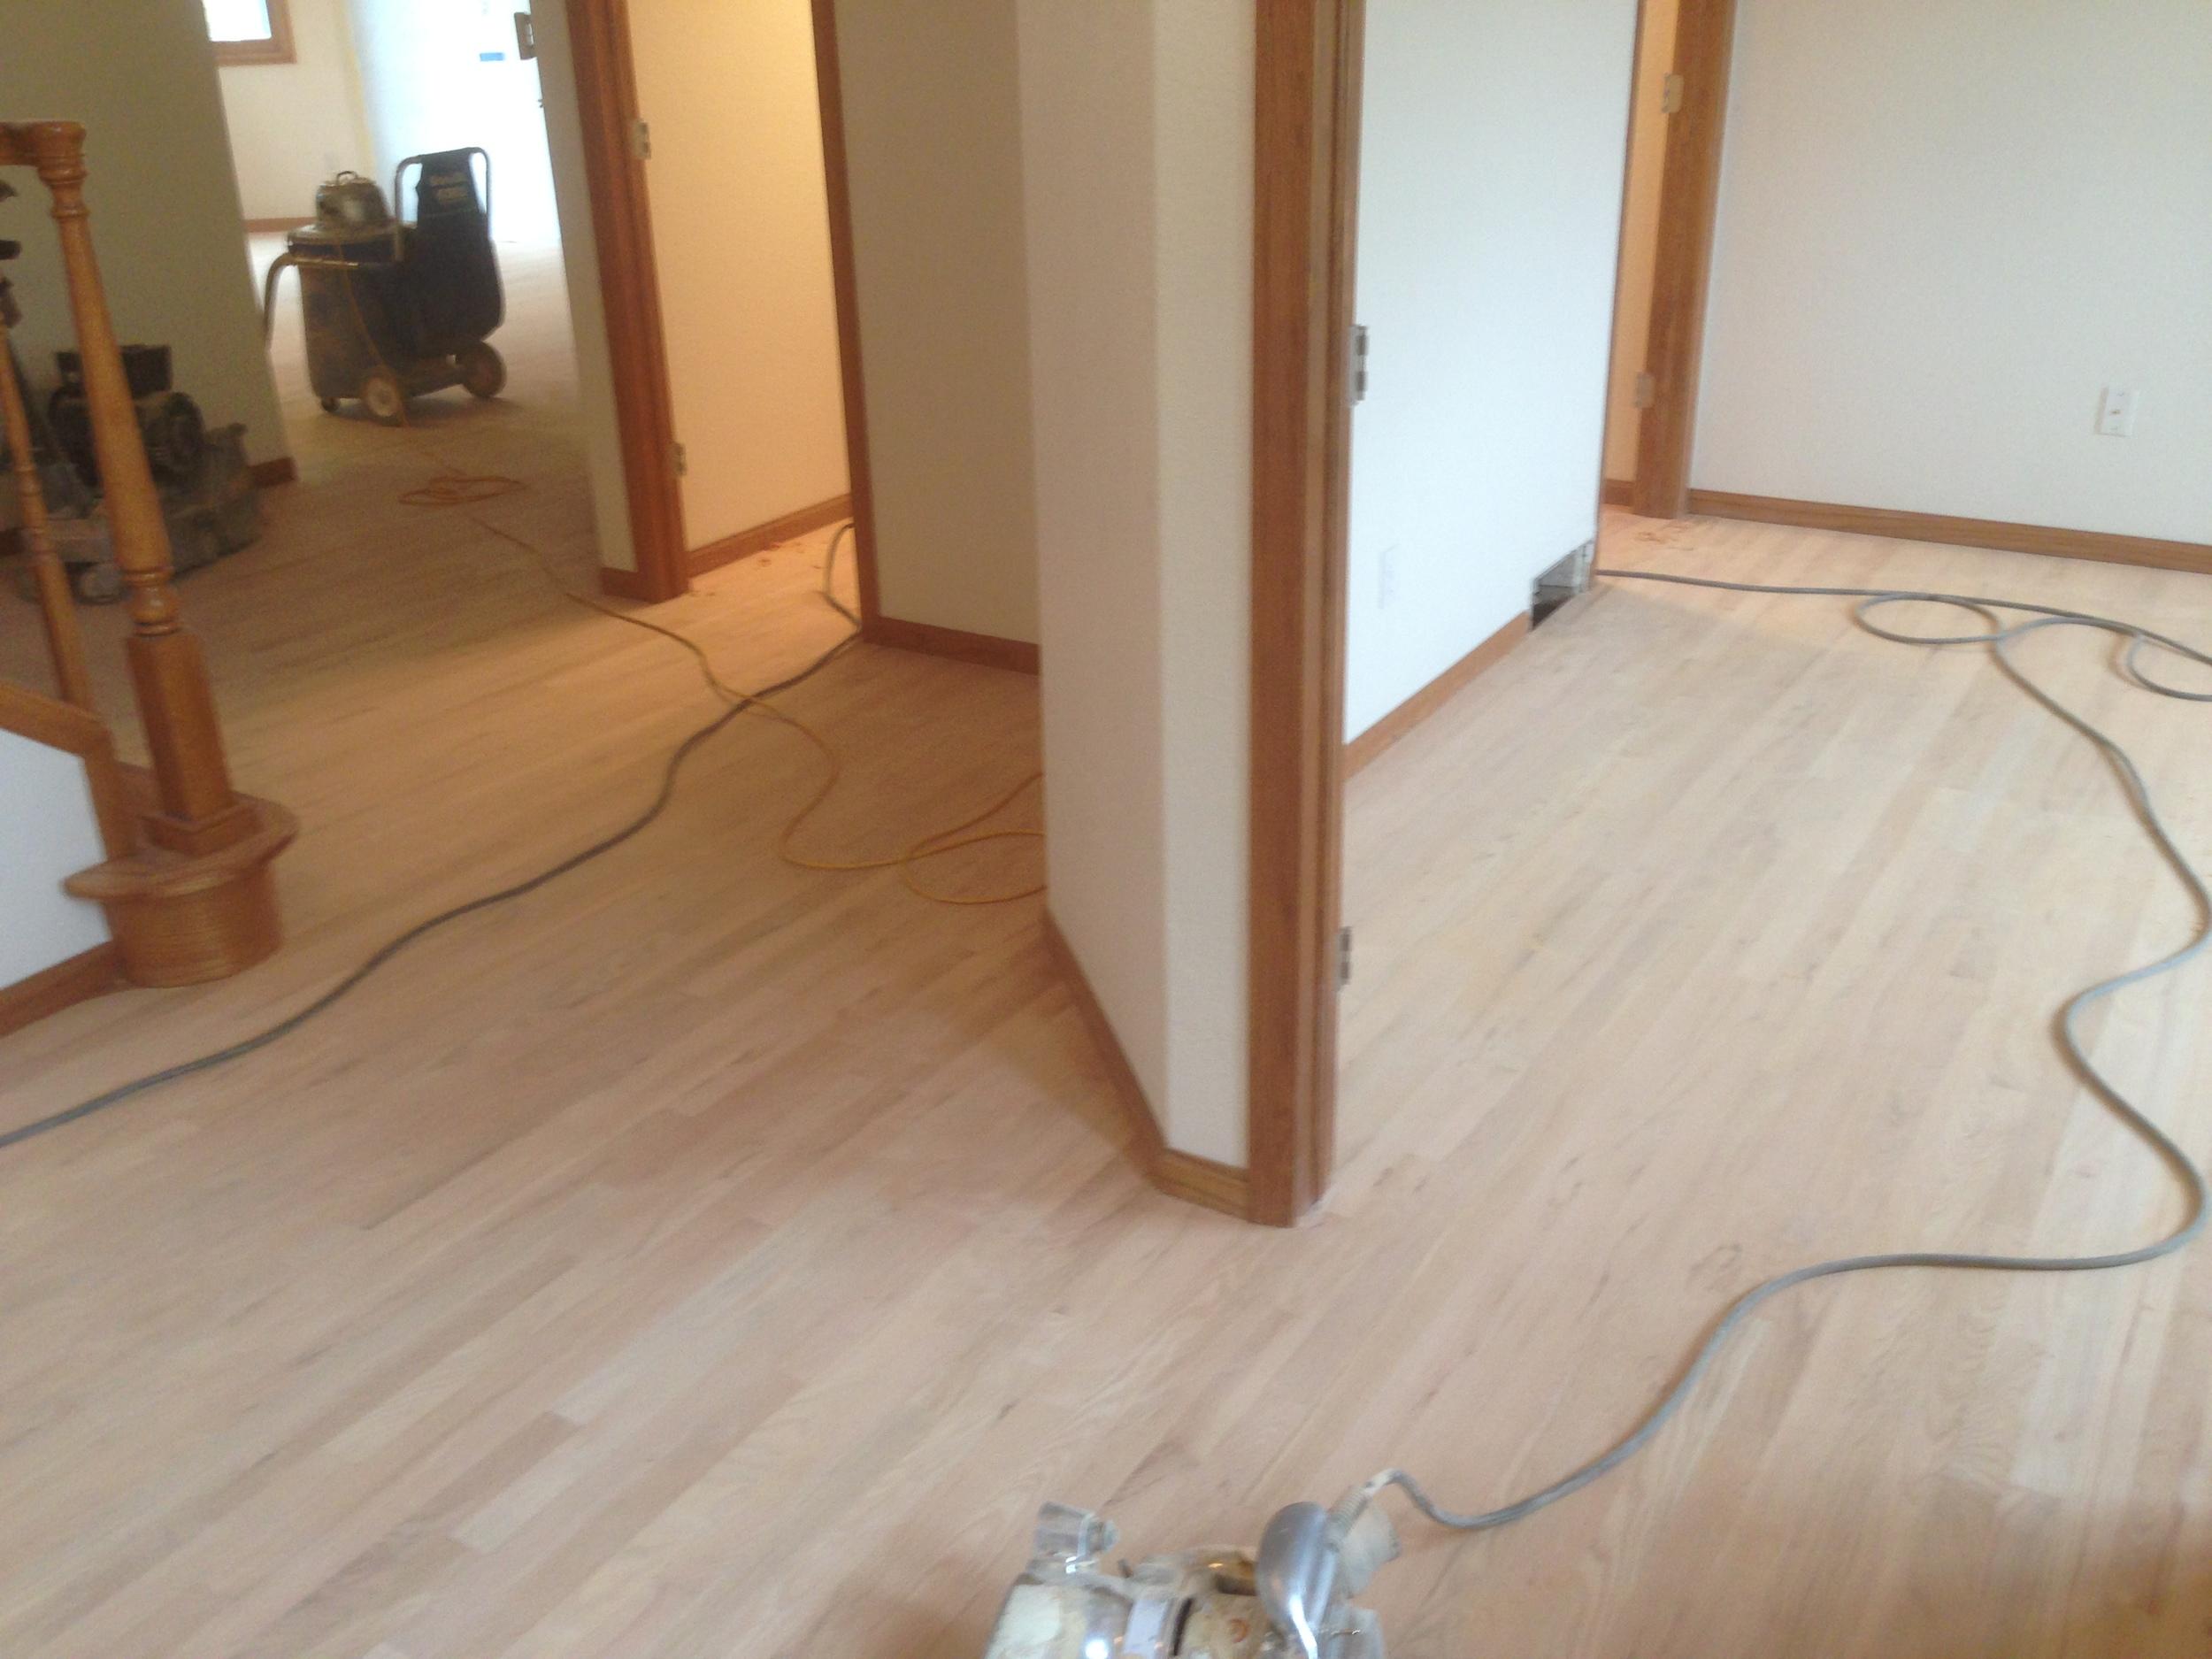 tan g modern plan martin kee bedroom floor type keith boon